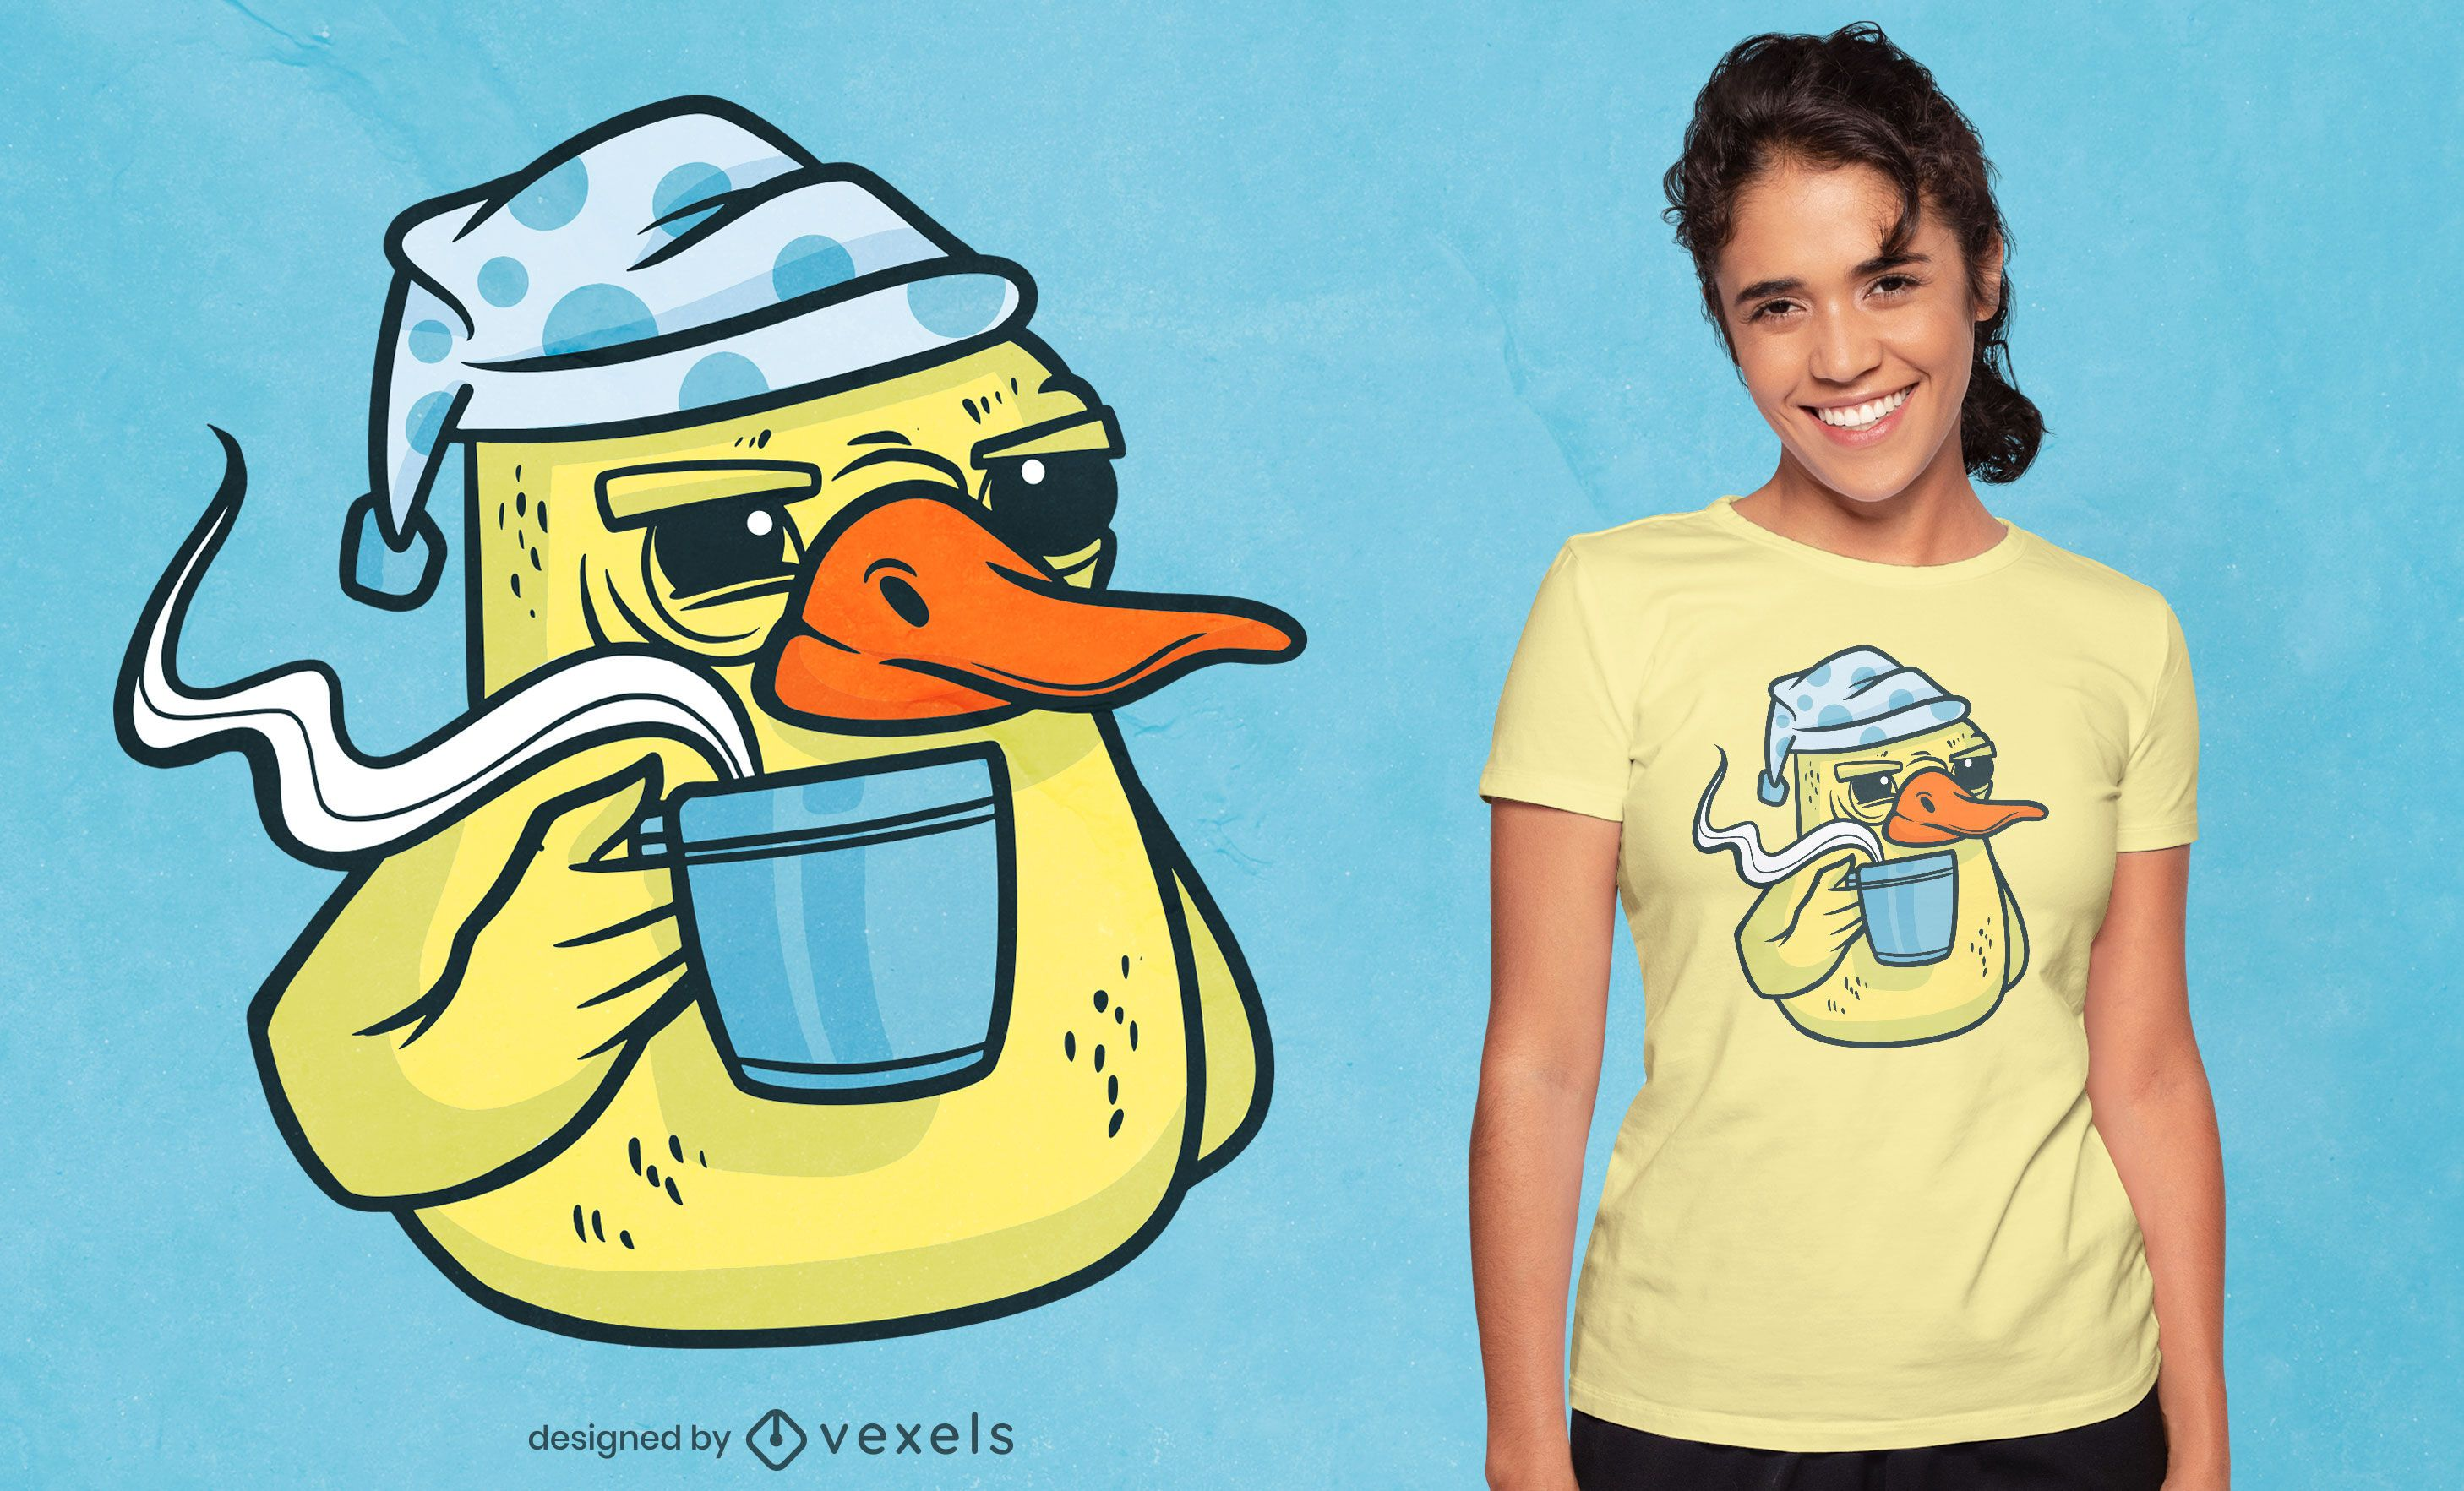 Duck coffee character t-shirt design